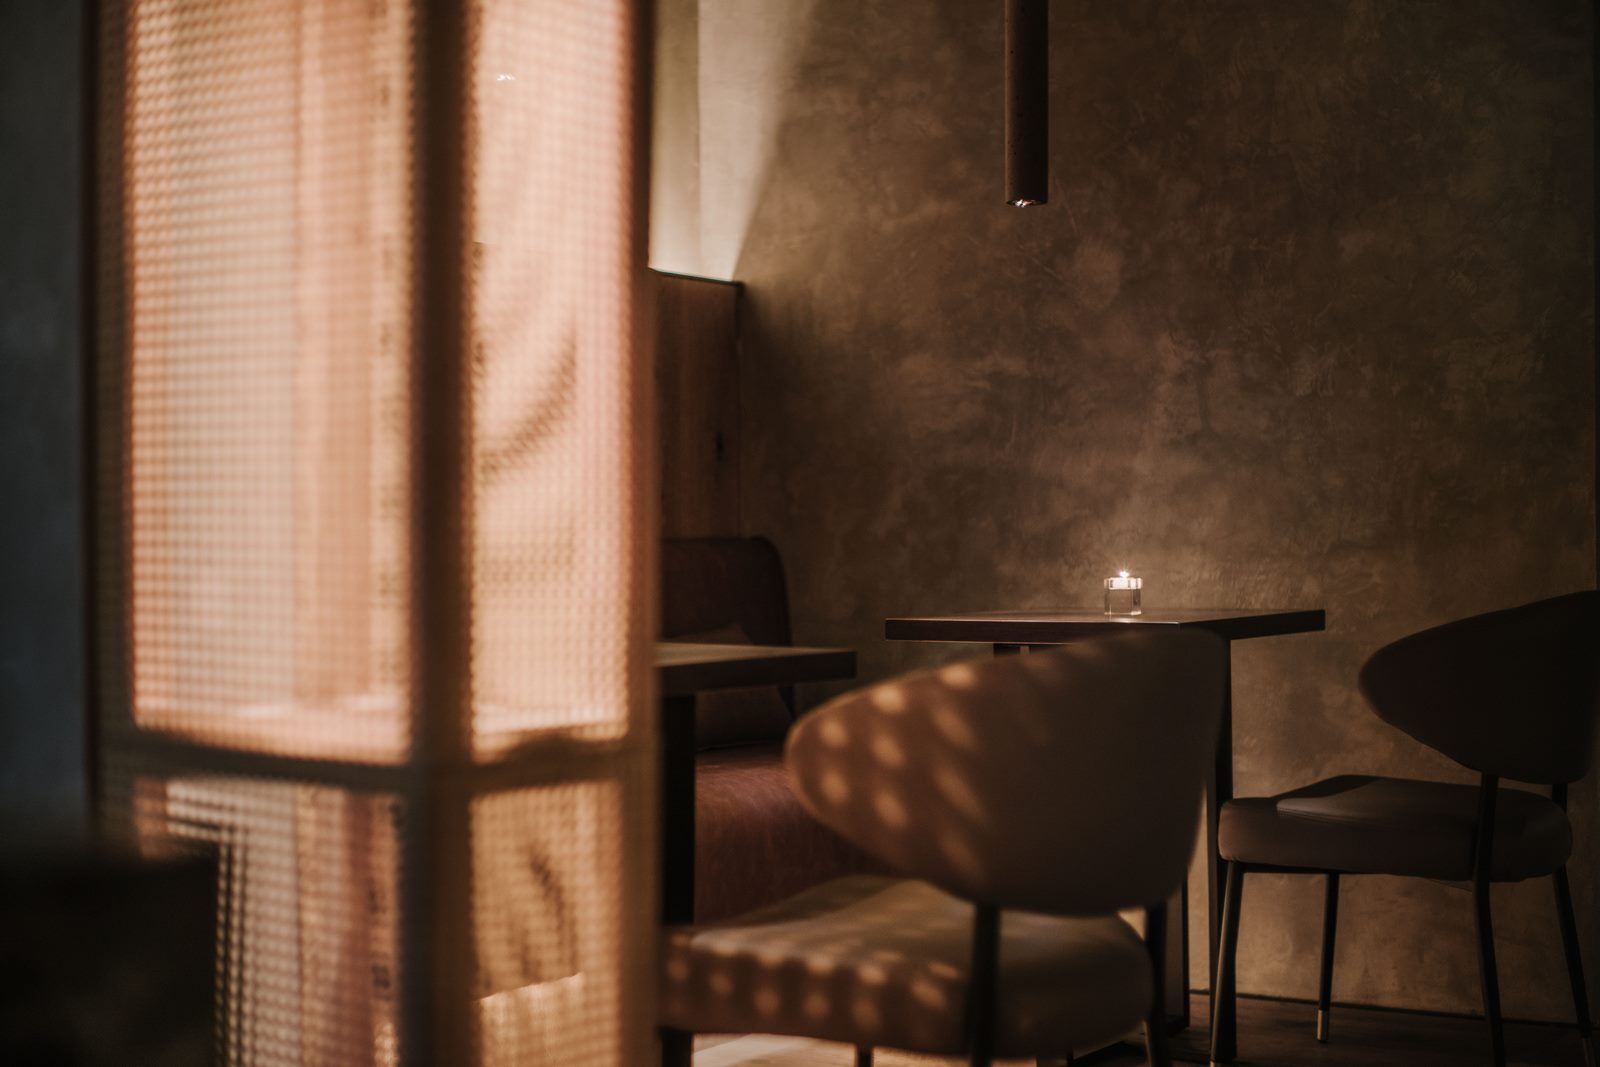 Los cócteles le dan sabor a The Tasting Room 13